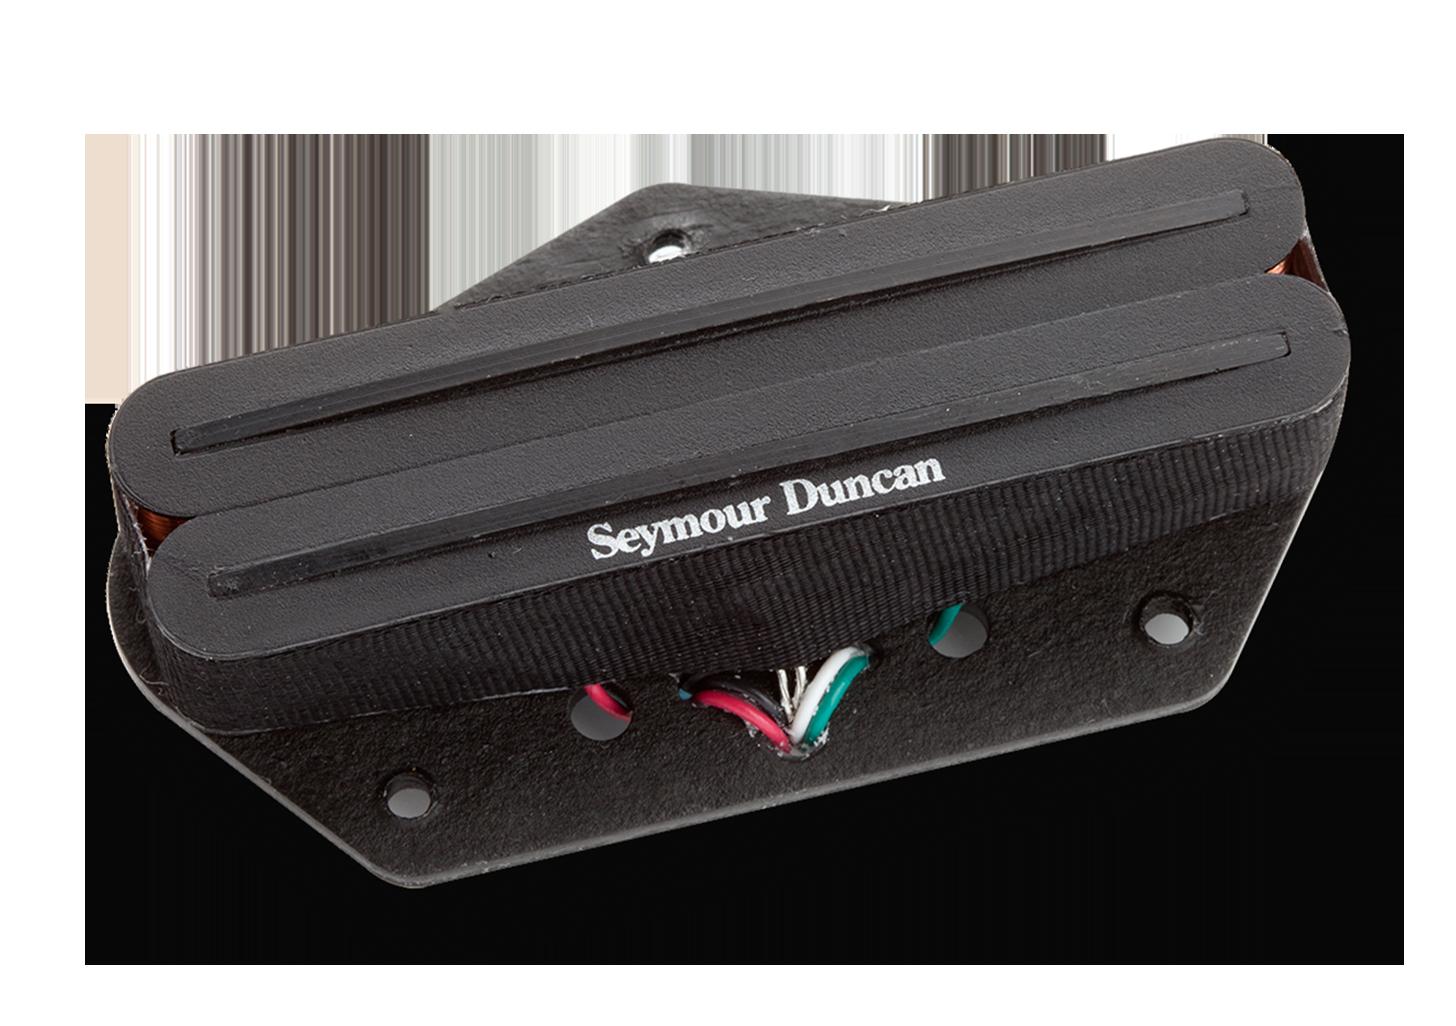 Seymour Duncan Hot Rails Tele - STHR-1B Bridge